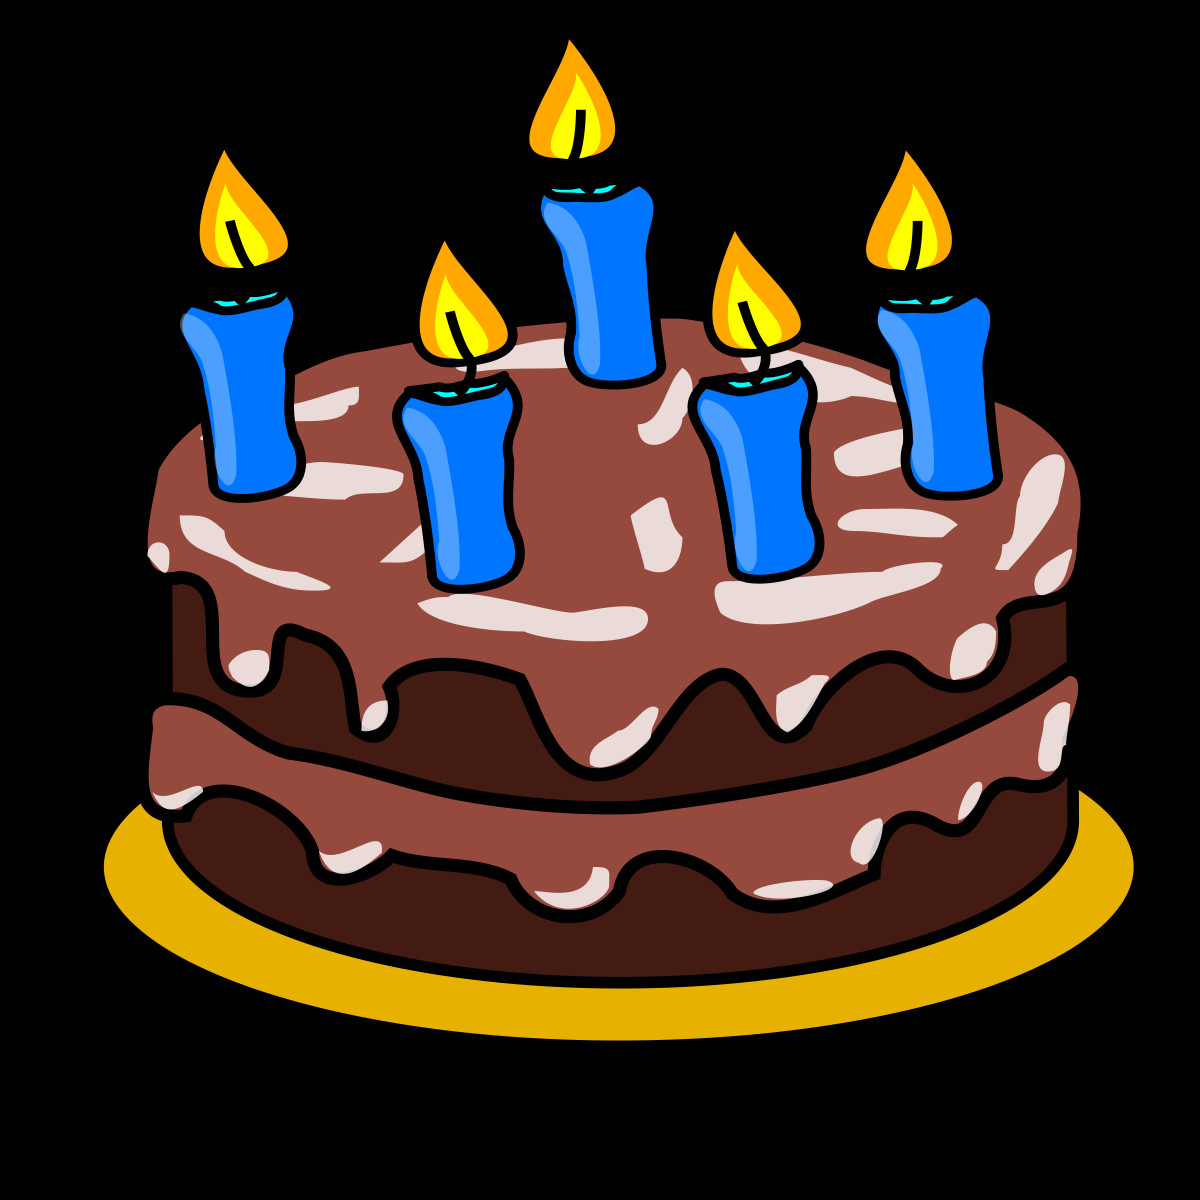 Clipart Birthday Cake  Birthday Cake Clip Art Free Download Clip Art